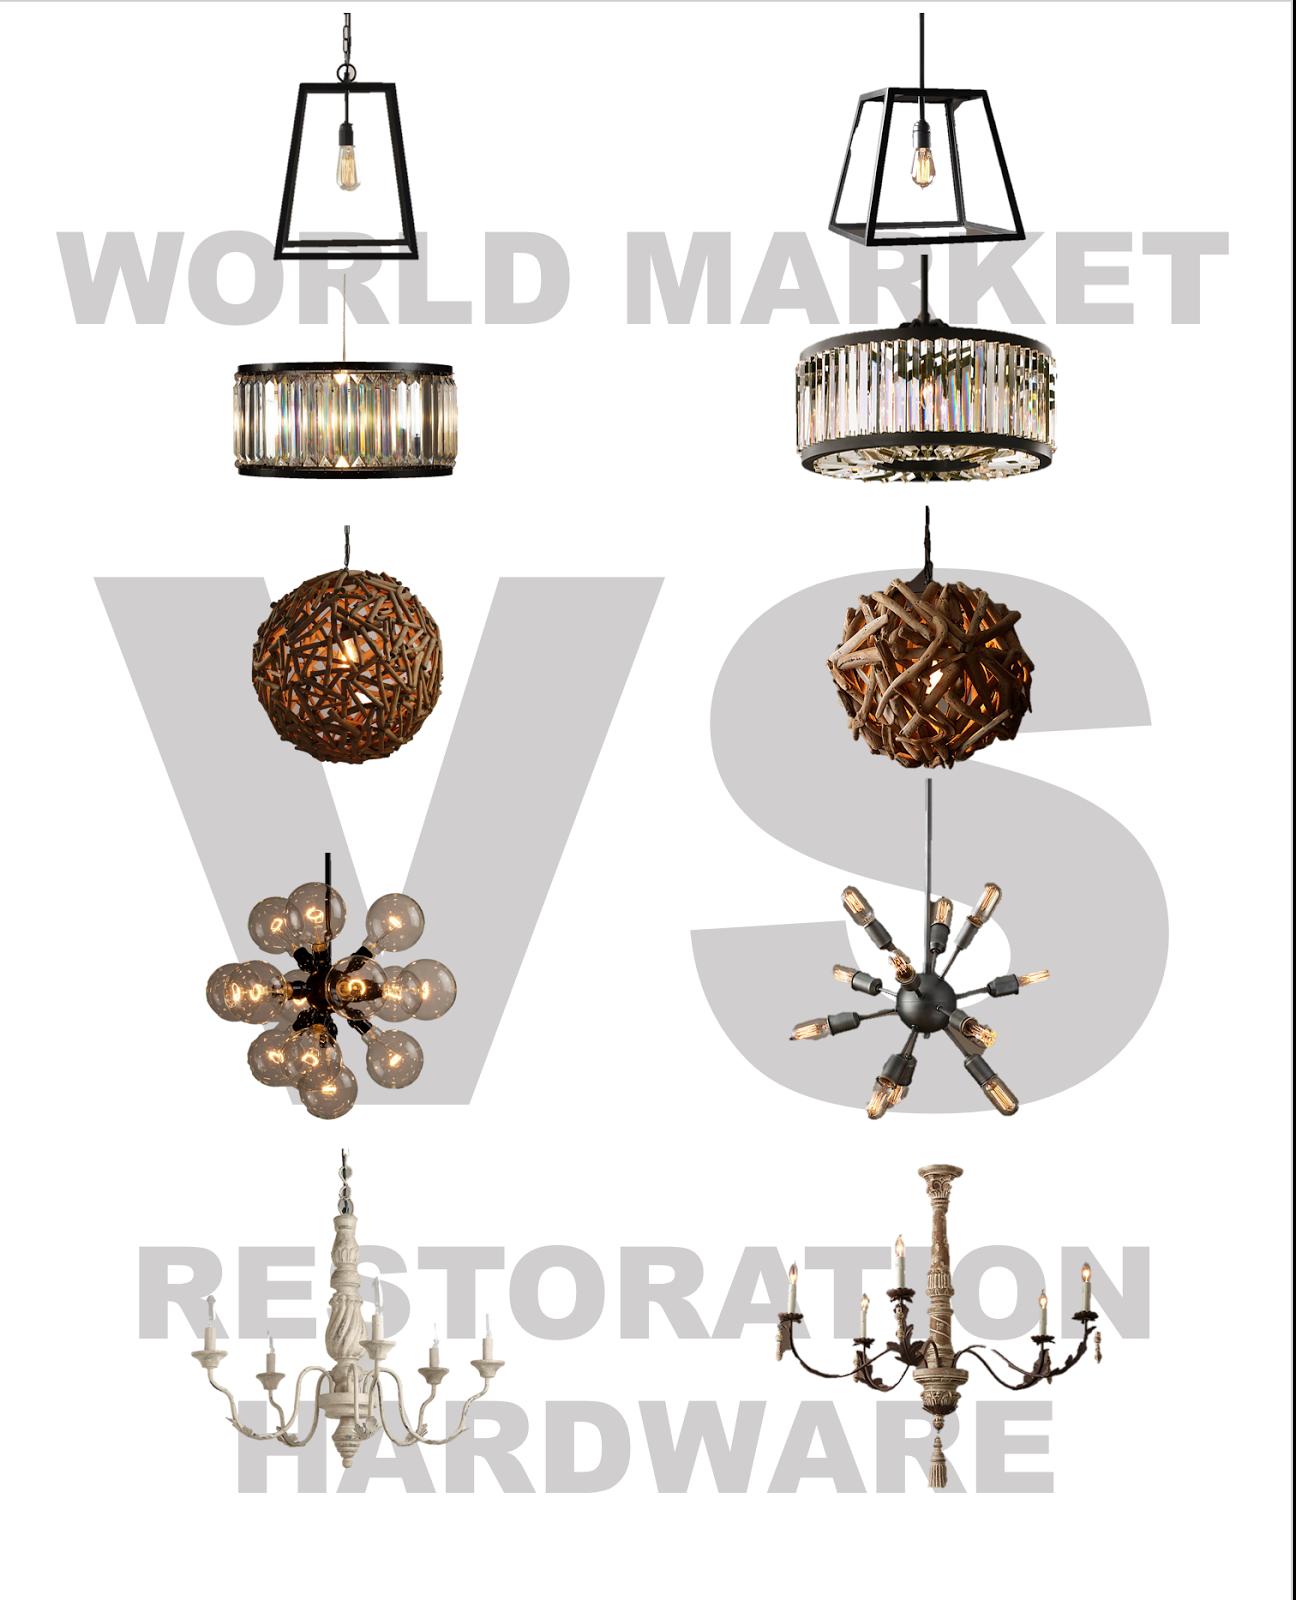 Restoration Hardware Lighting For Less: {Jessica Stout Design}: World Market Vs. Restoration